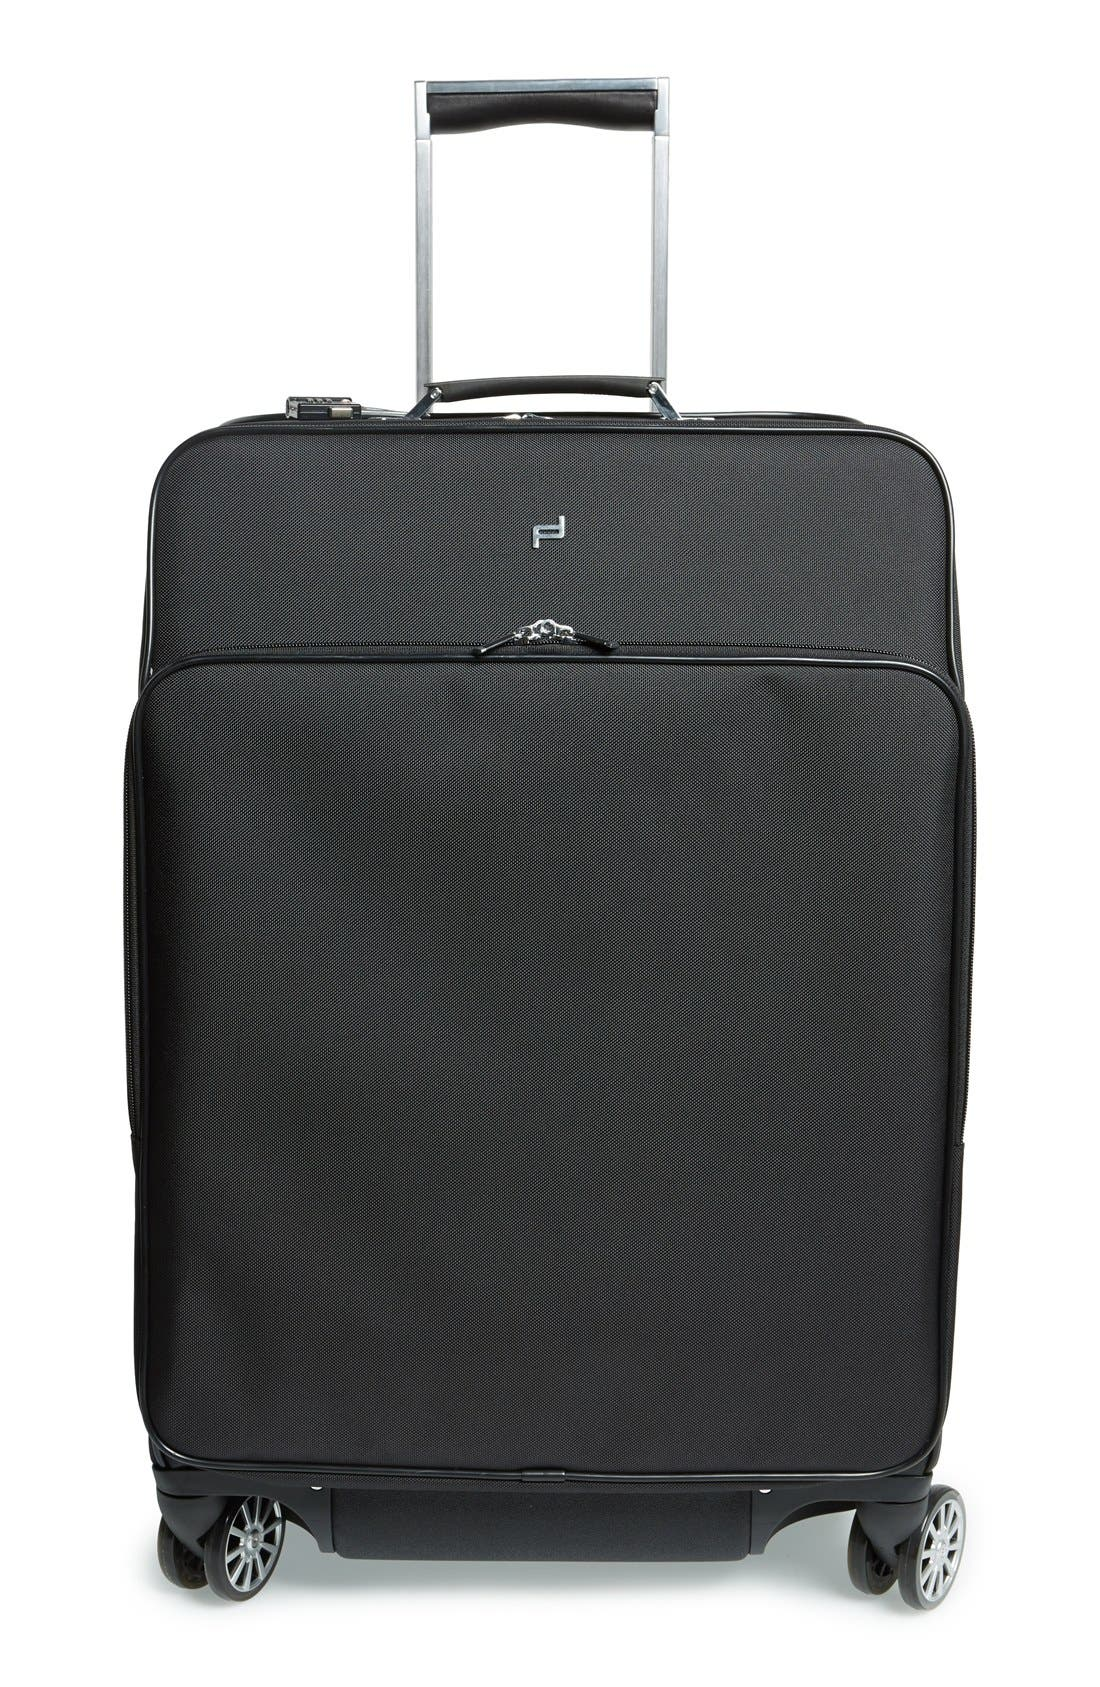 PORSCHE DESIGN 'Roadster 3.0' Wheeled Suitcase